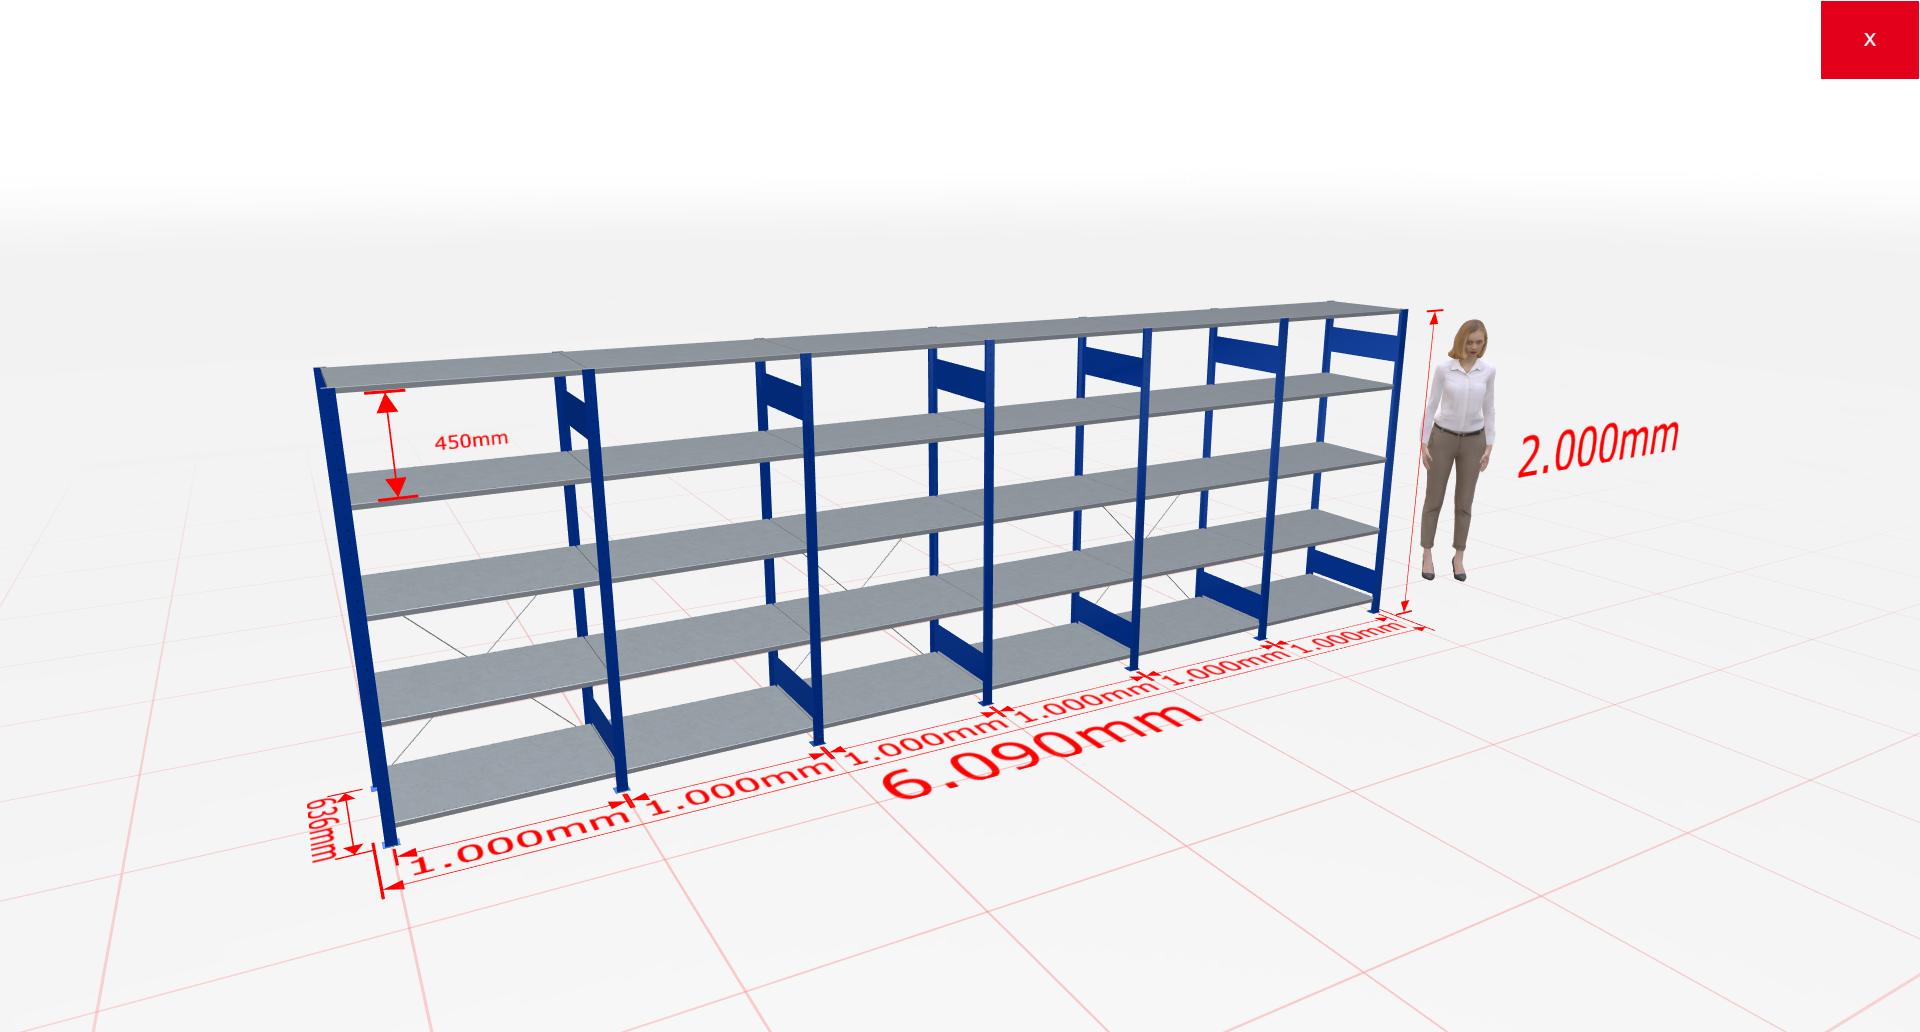 Fachbodenregal Komplettregal 2000x6090x600 mm (HxBxT) SCHULTE Lagertechnik blau 5 Ebenen  150 kg je Boden